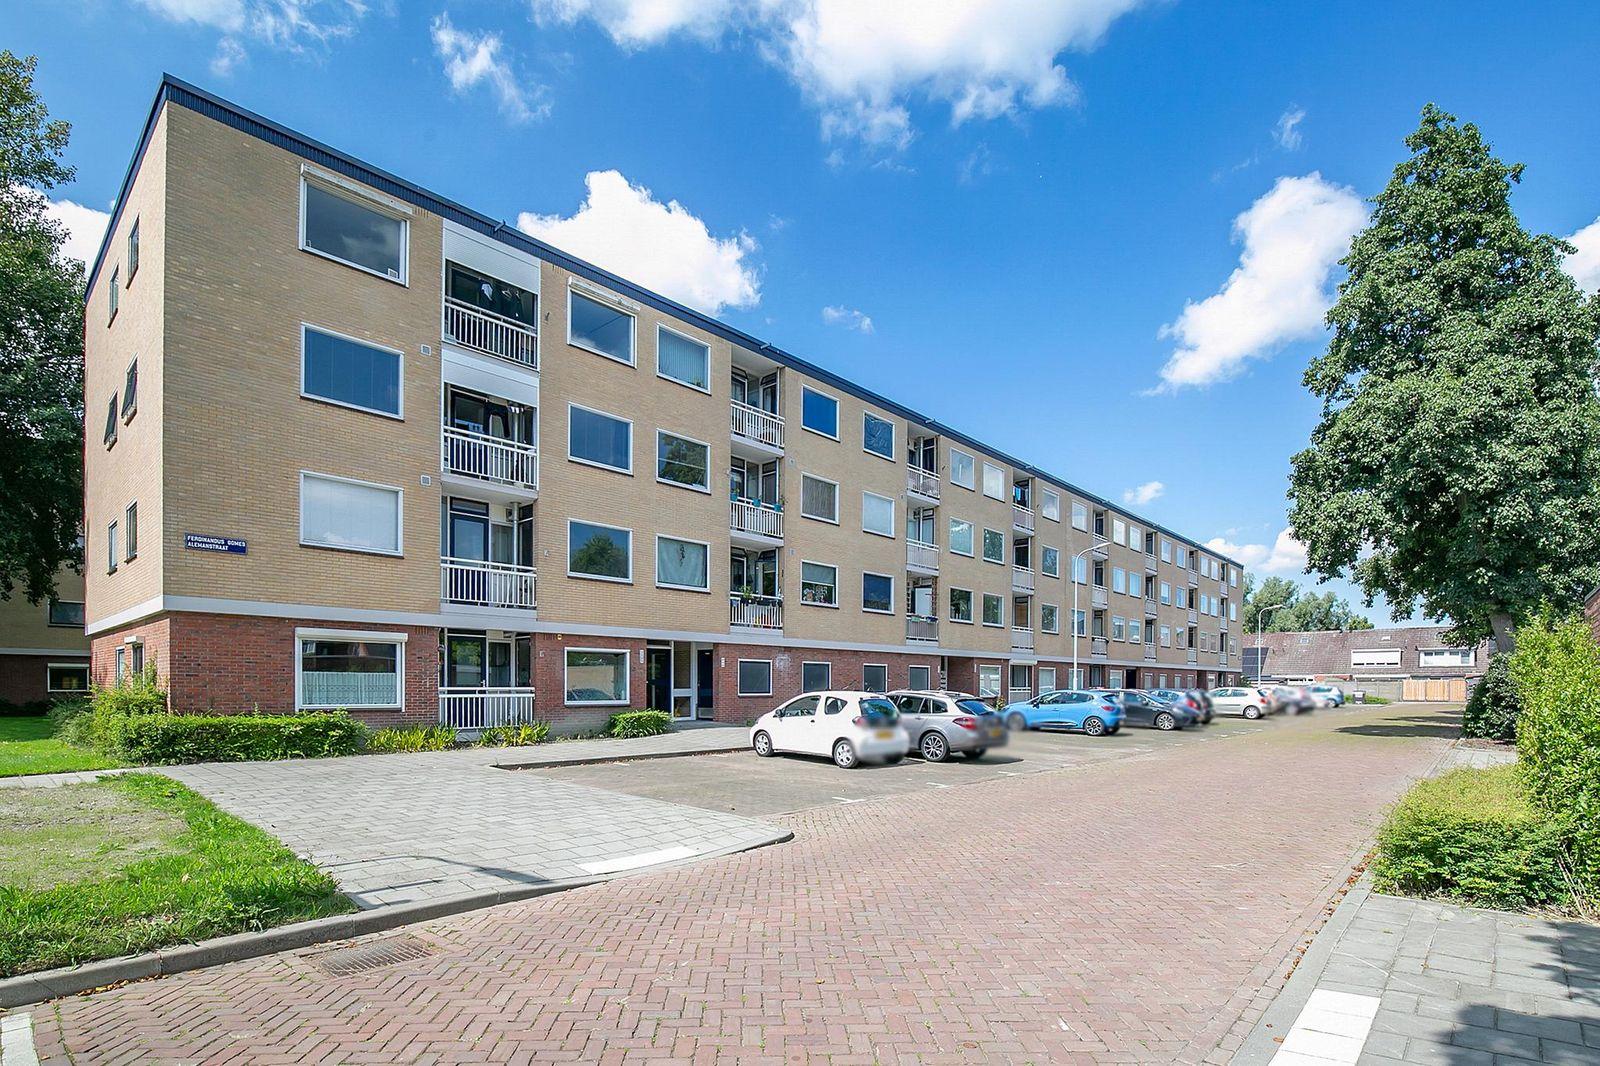 Ferdinandus Gomes Alemanstraat 32, Middelburg